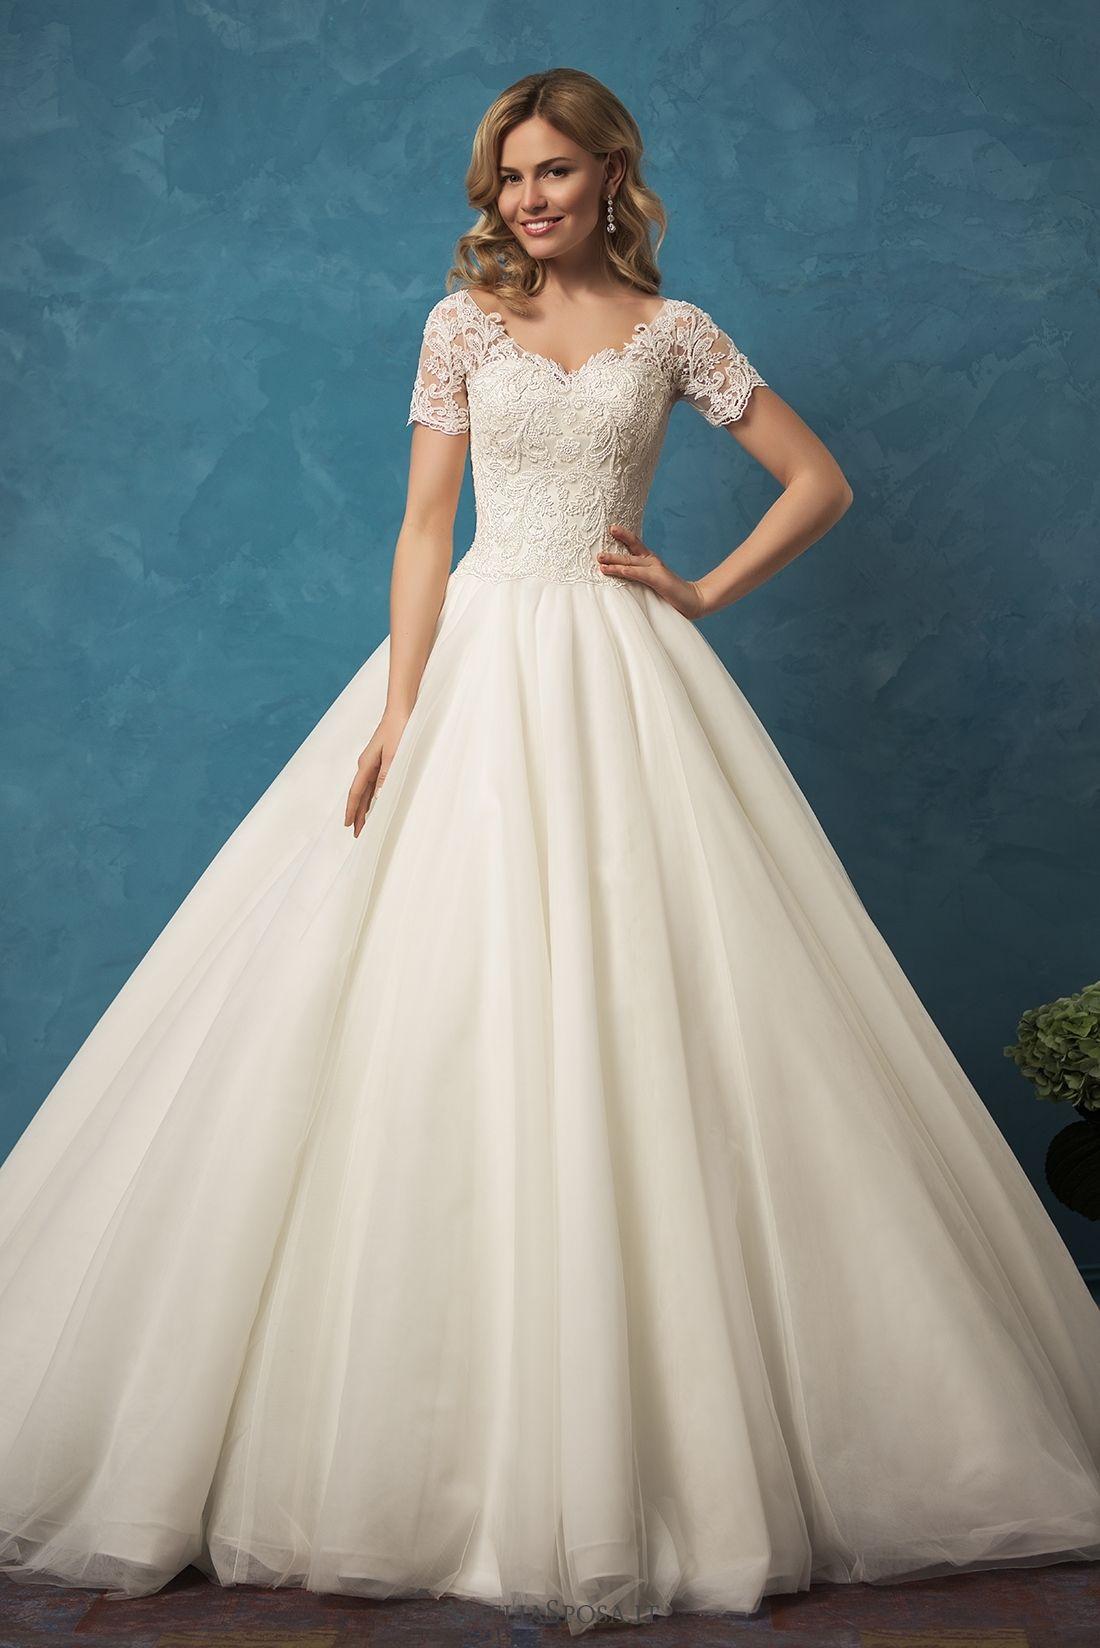 Wedding dress short in front with long train  Wedding dress Alyssa  Amelia Sposa  Vestido de noiva  Princesa